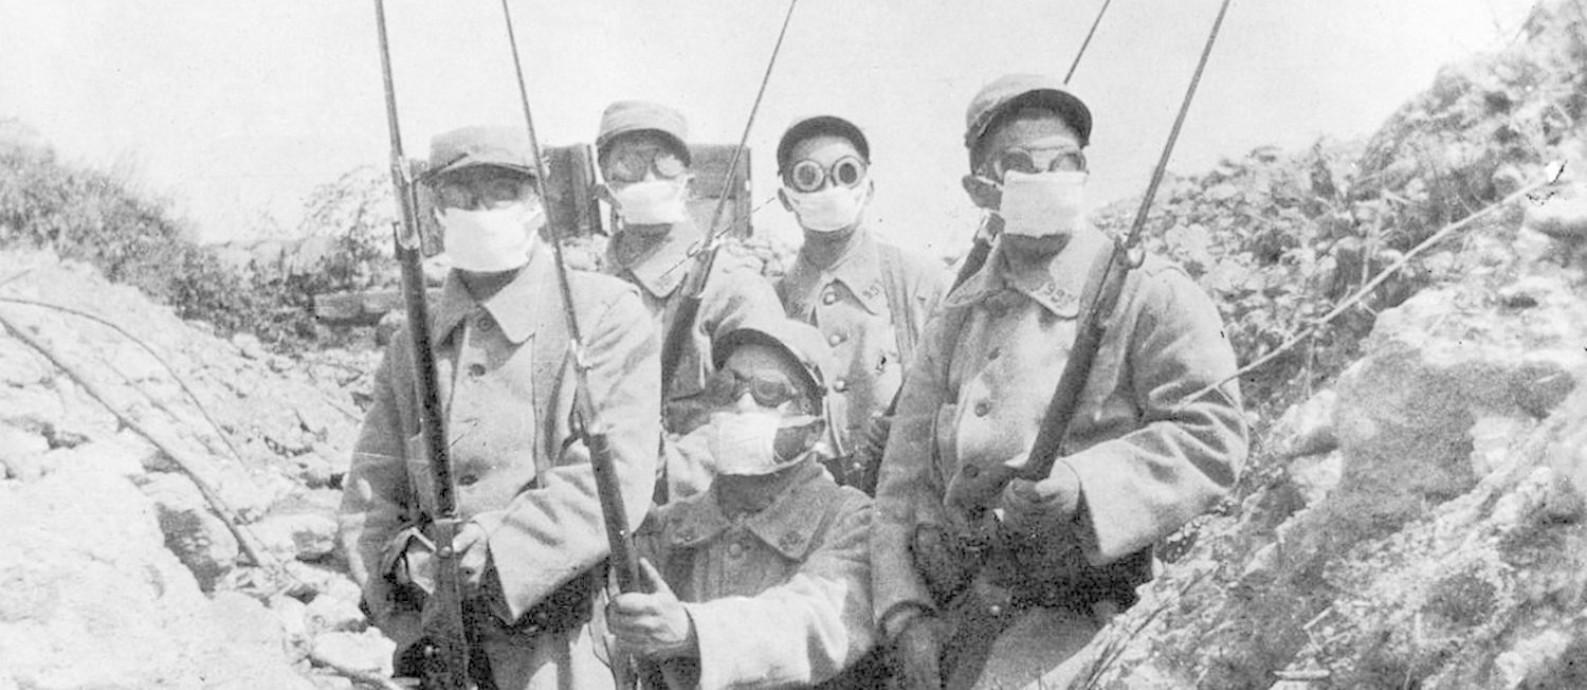 Soldados franceses vestem um protótipo de mascará de gás durante a segunda batalha de Ypres, por volta de 1915 Foto: Hulton Archive / Getty Images